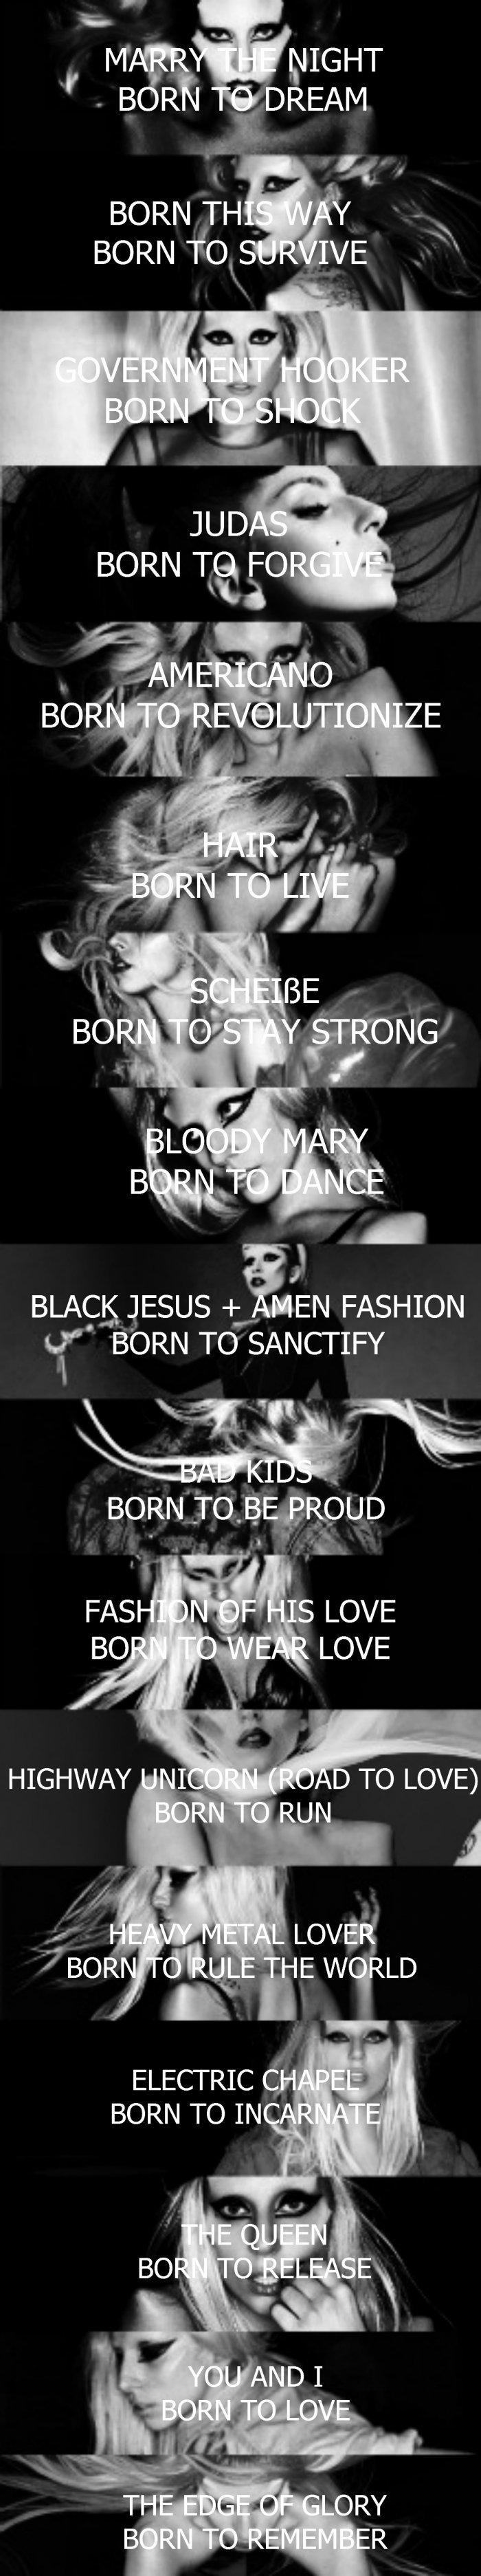 Black Jesus Quotes Born To Be Lady Gaga  Pinterest  Lady Gaga